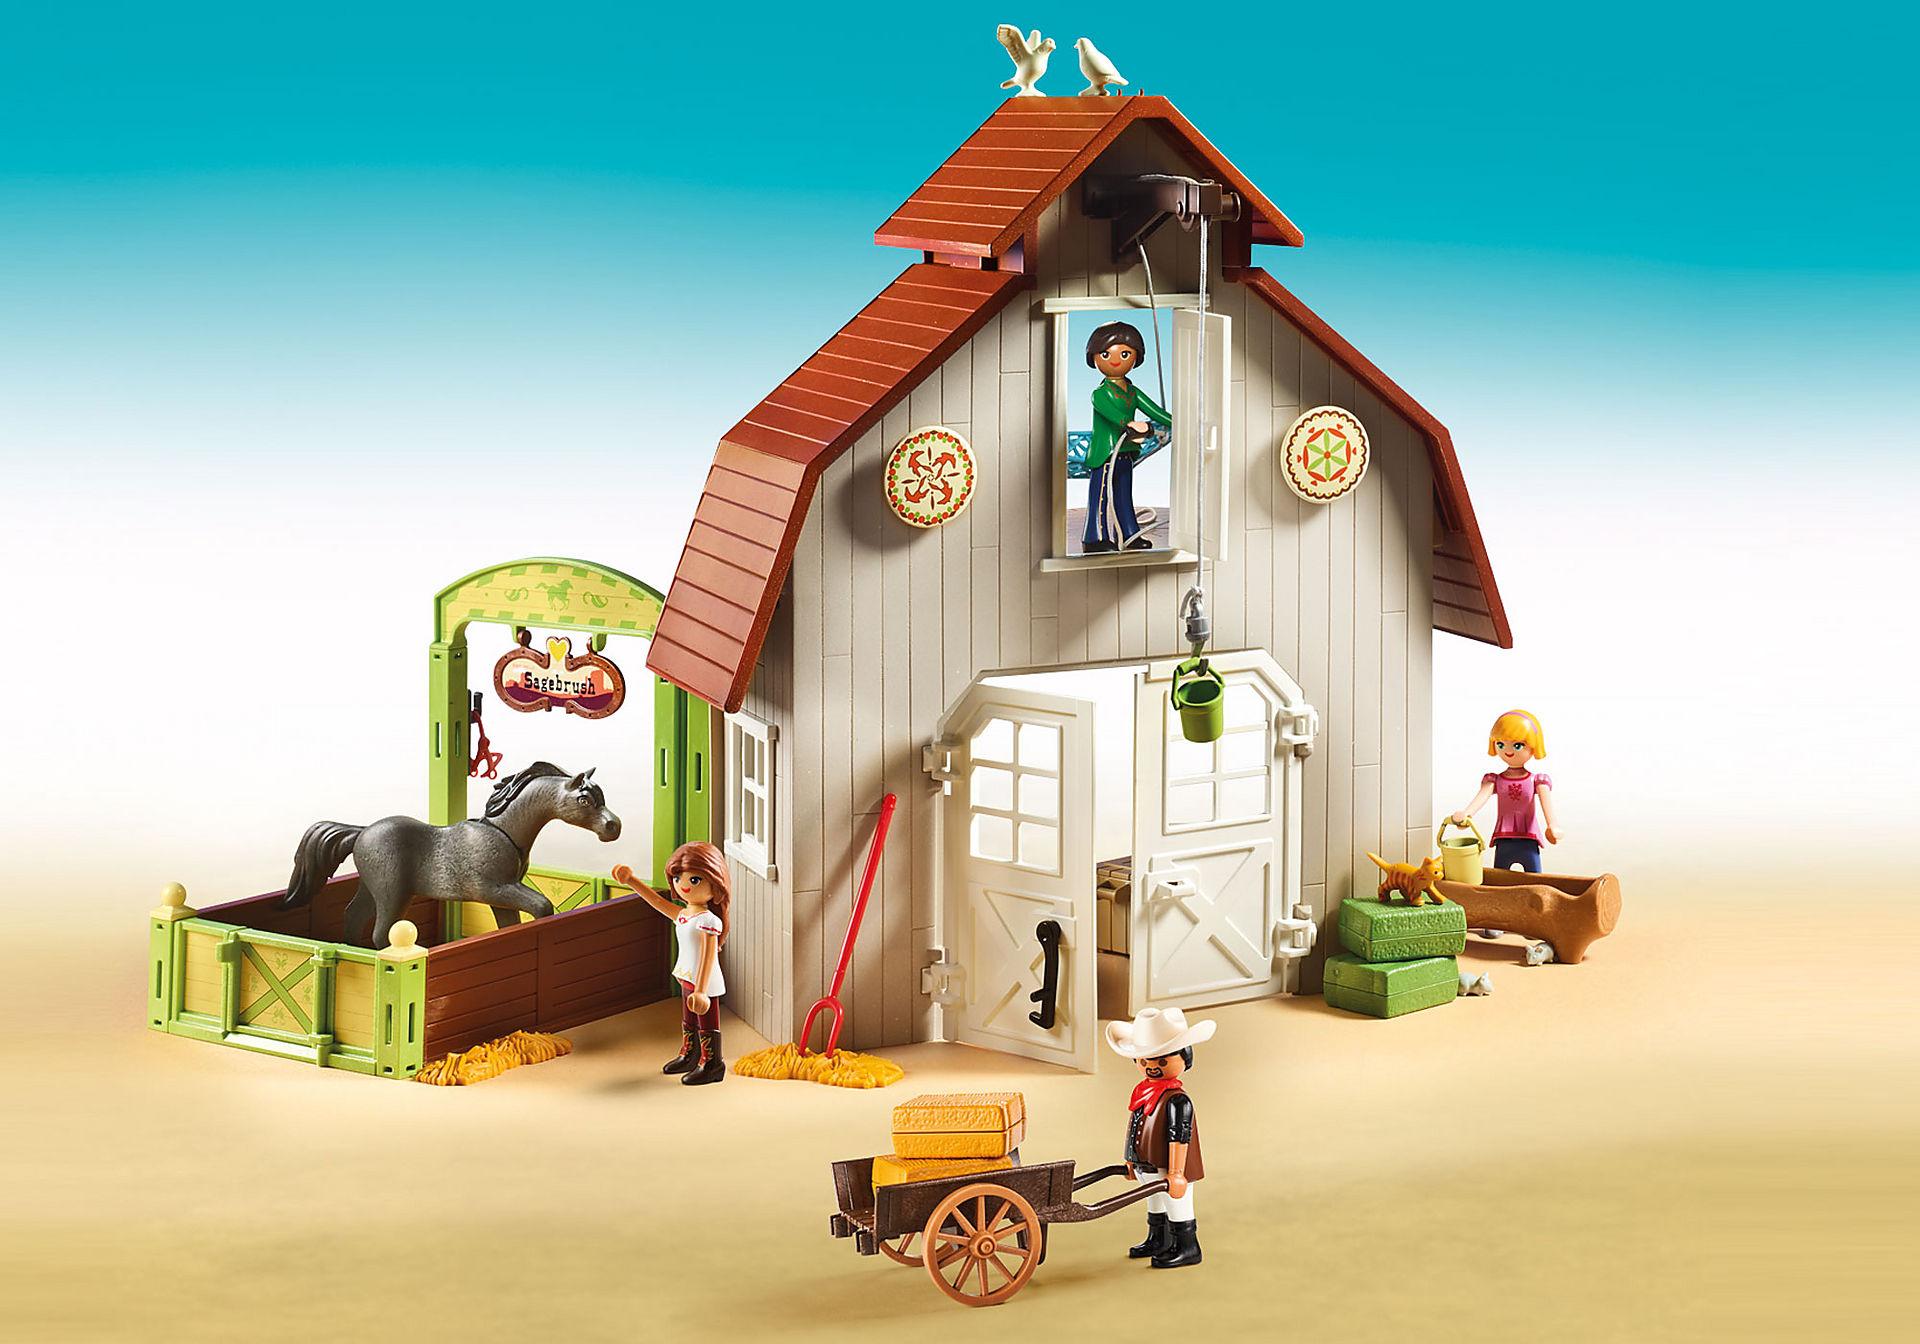 http://media.playmobil.com/i/playmobil/70118_product_extra3/Aχυρώνας με τη Λάκυ, την Πρου και την Άμπιγκεϊλ